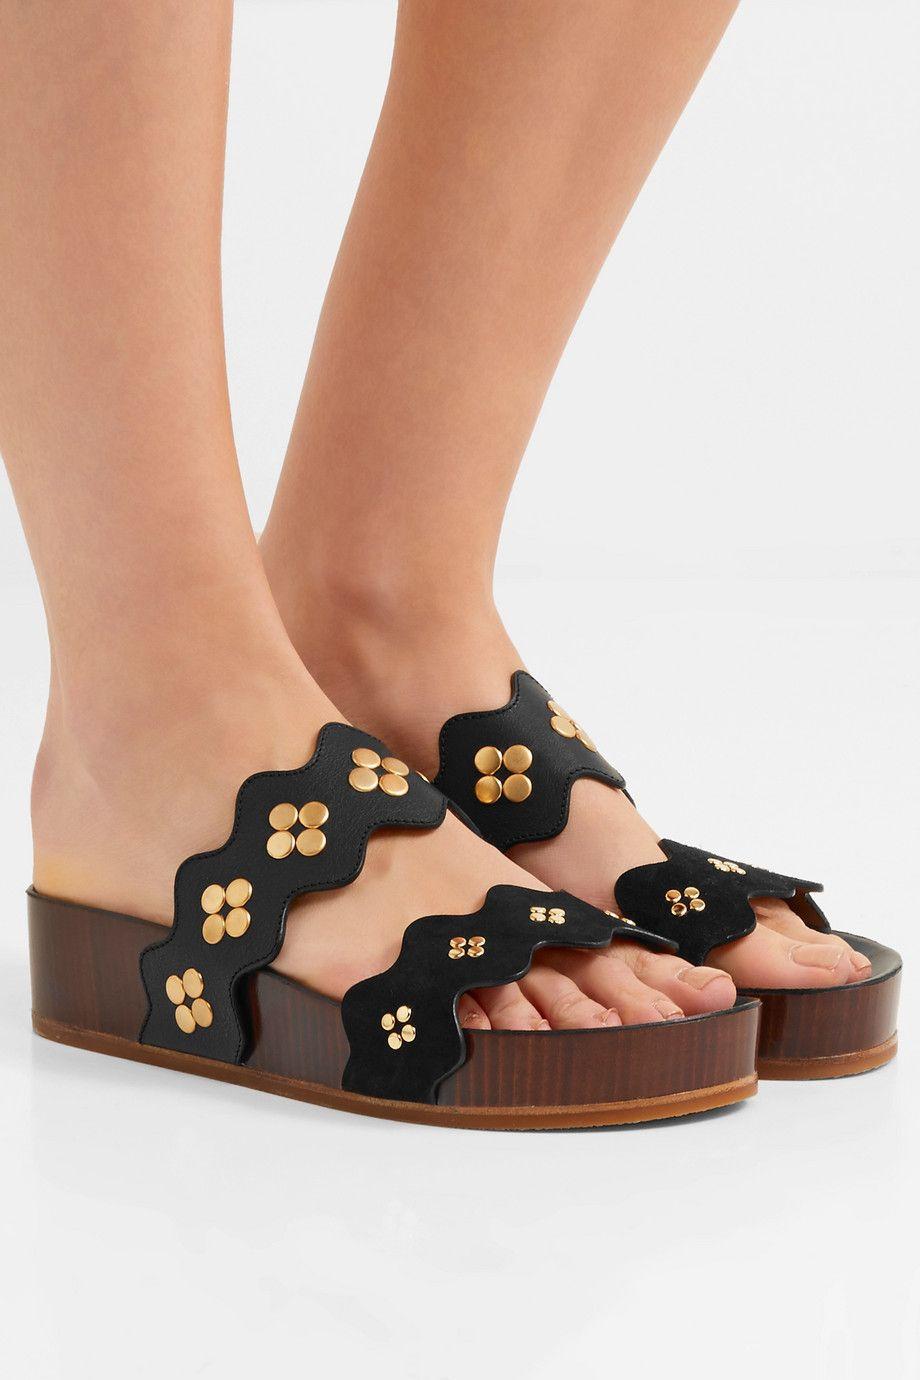 Chloé Lauren Leather Slides qxZXG